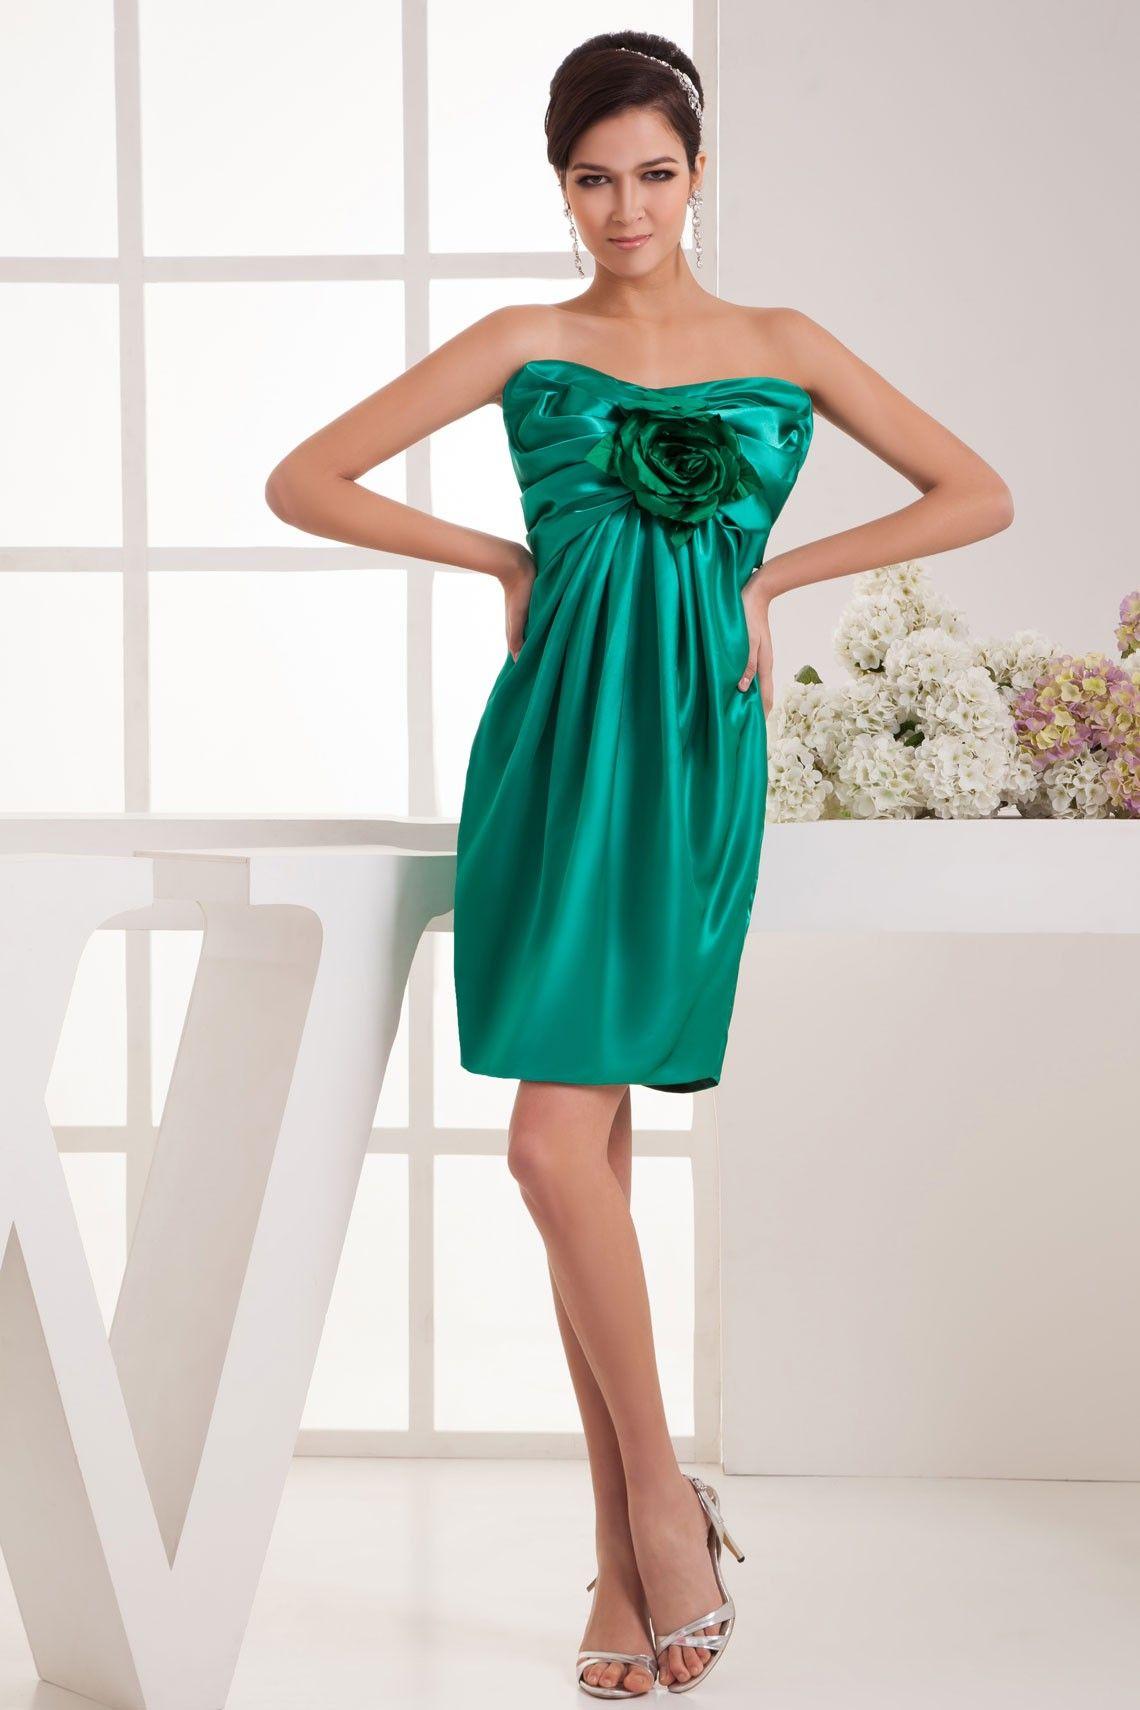 Elastic Silk Like Satin Mini-length Strapless Empire Flowers Zipper Cocktail Dress ADB2623 $228.99 Short Cocktail Dresses